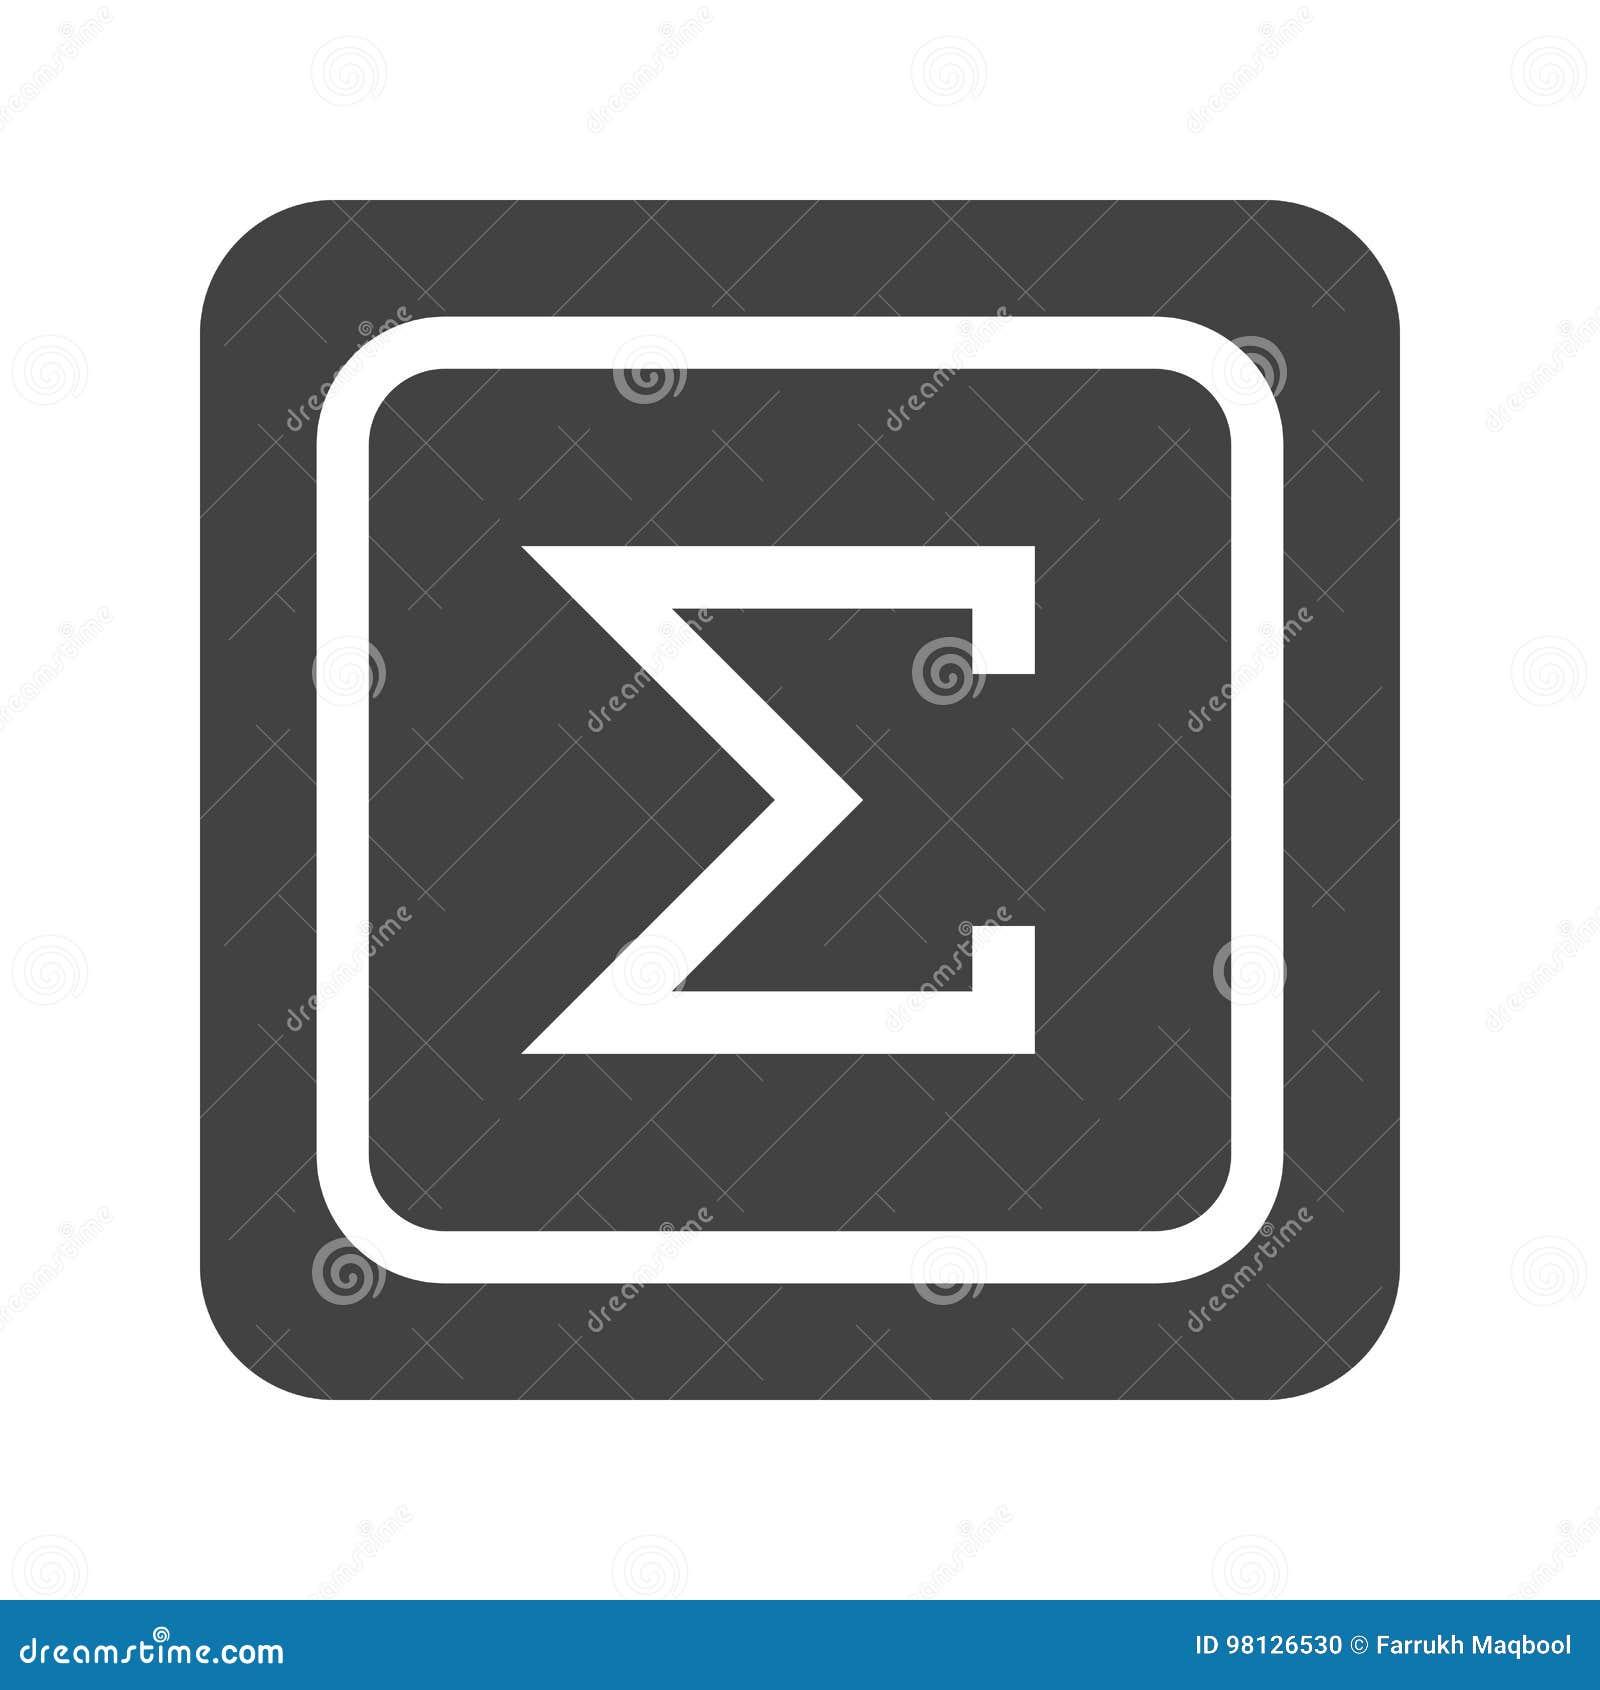 Summation Symbol Stock Vector Illustration Of Number 98126530